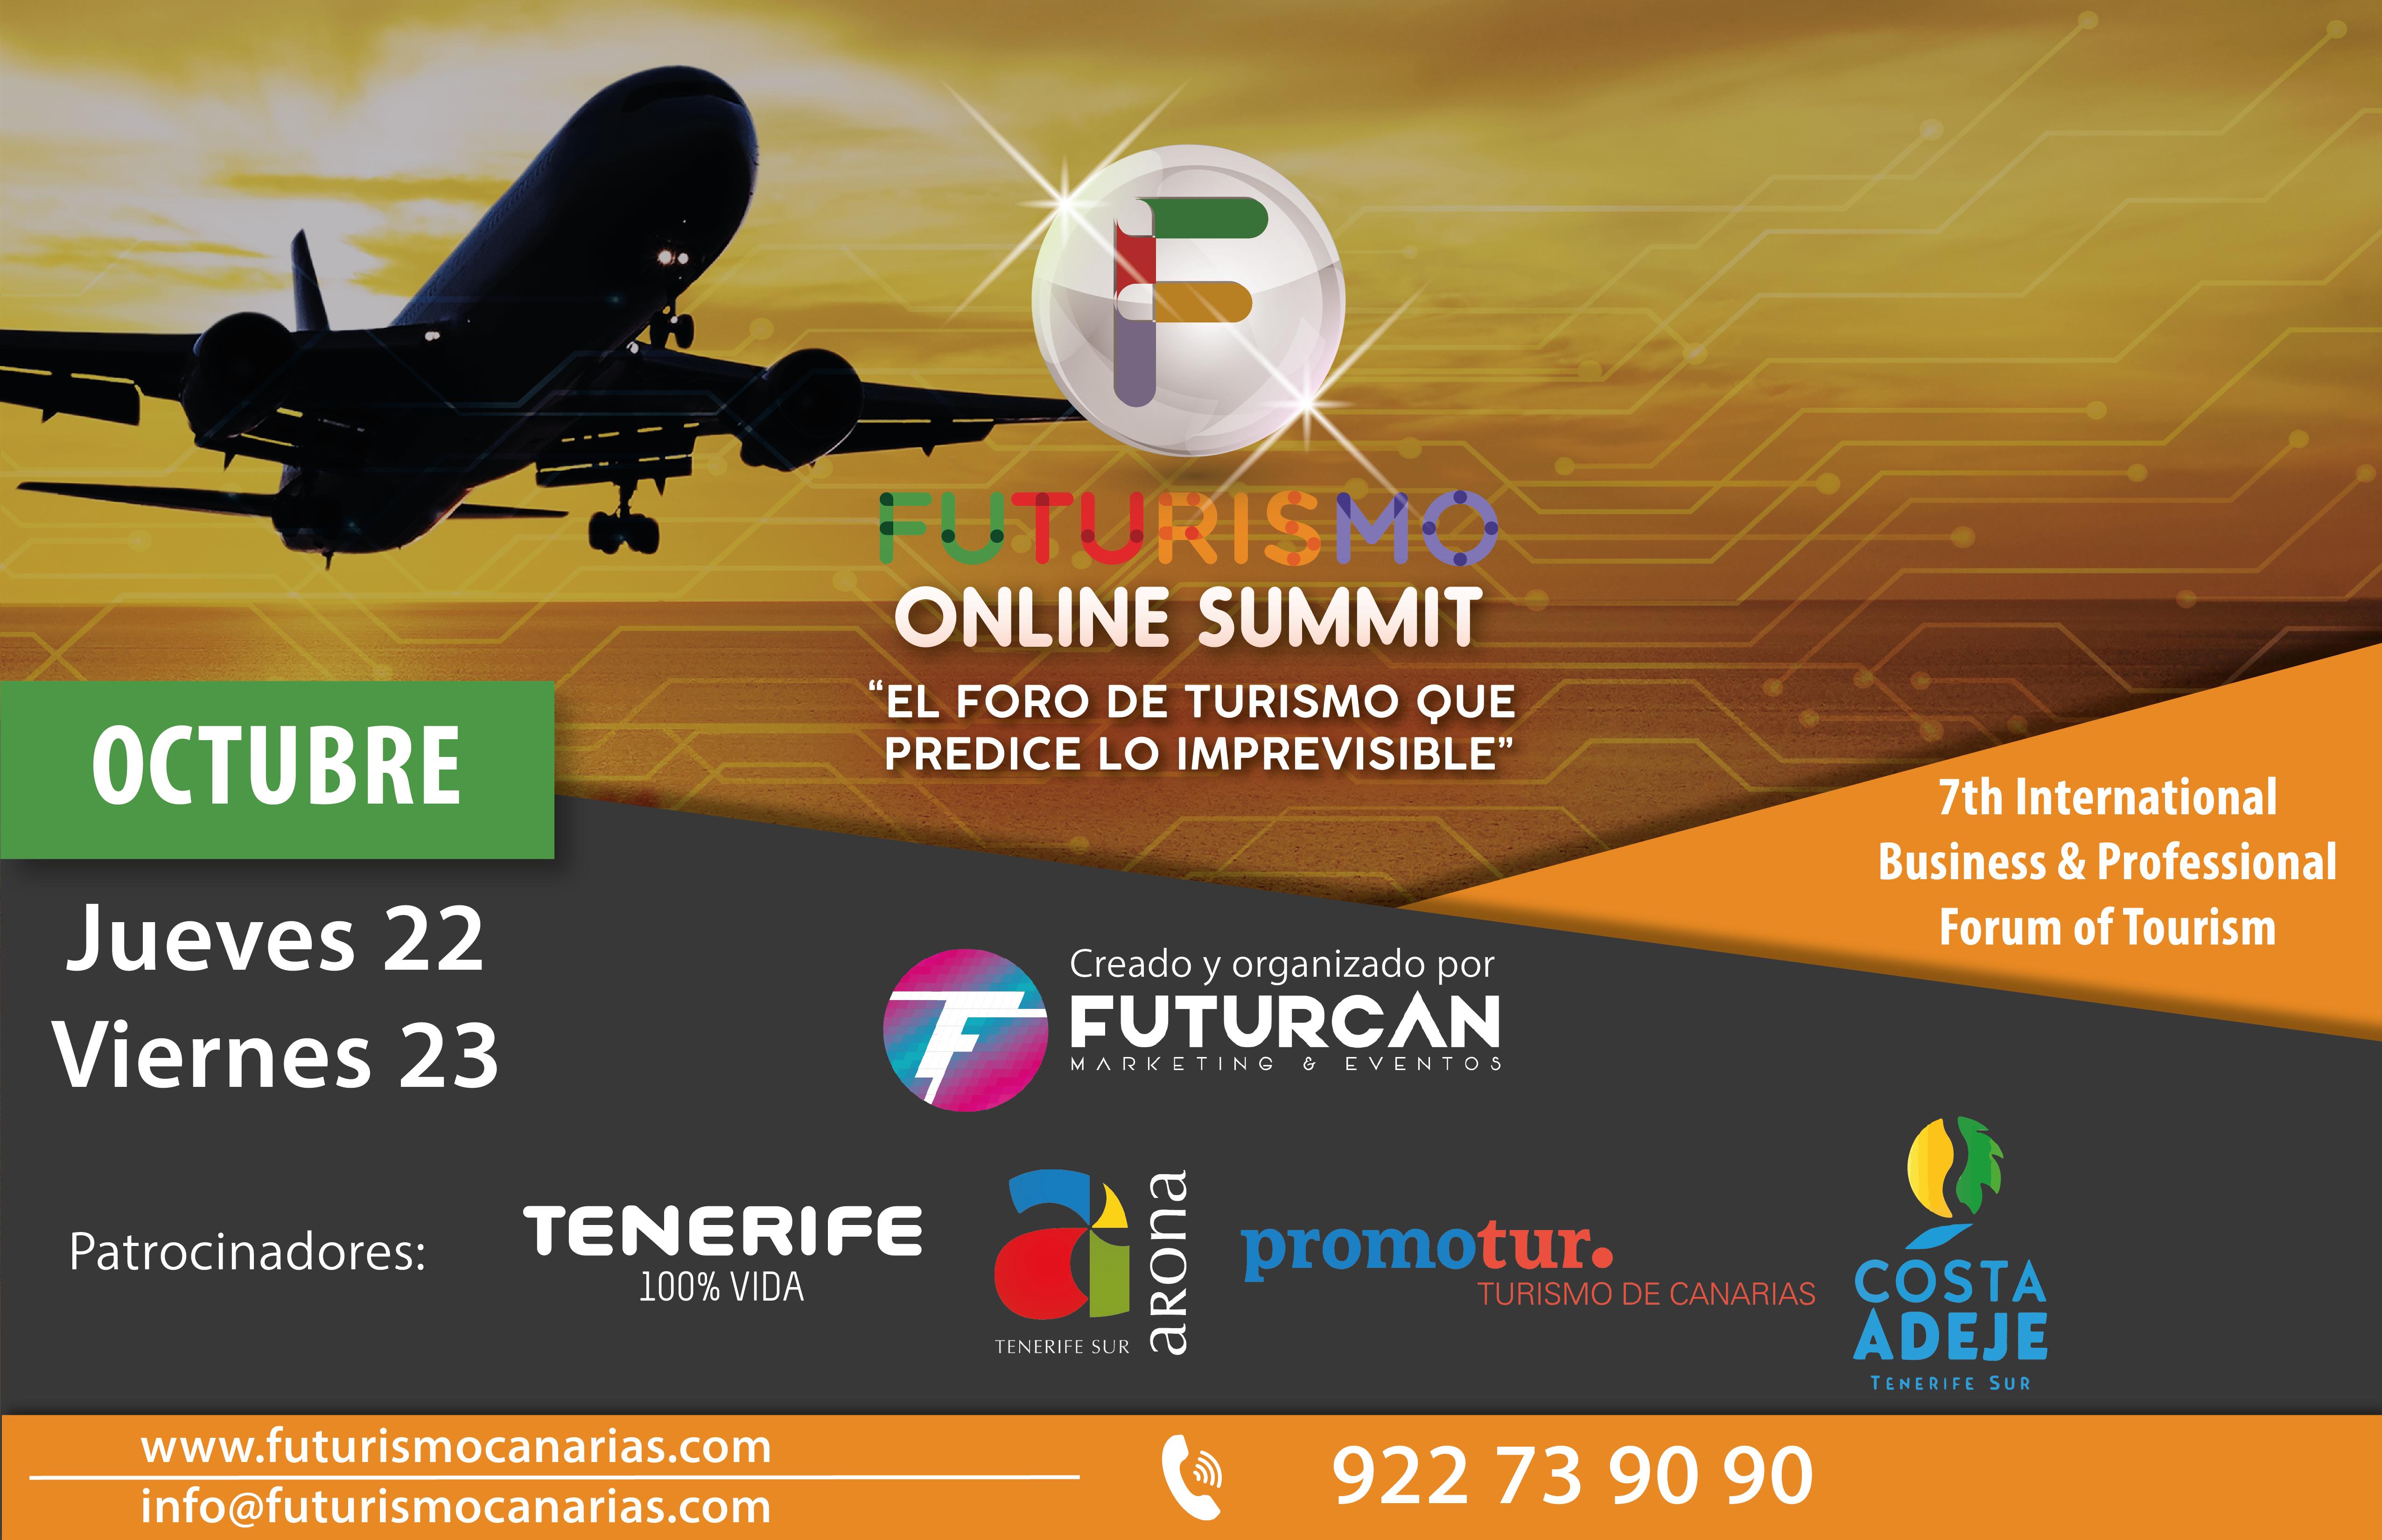 cartel futurismo online summit